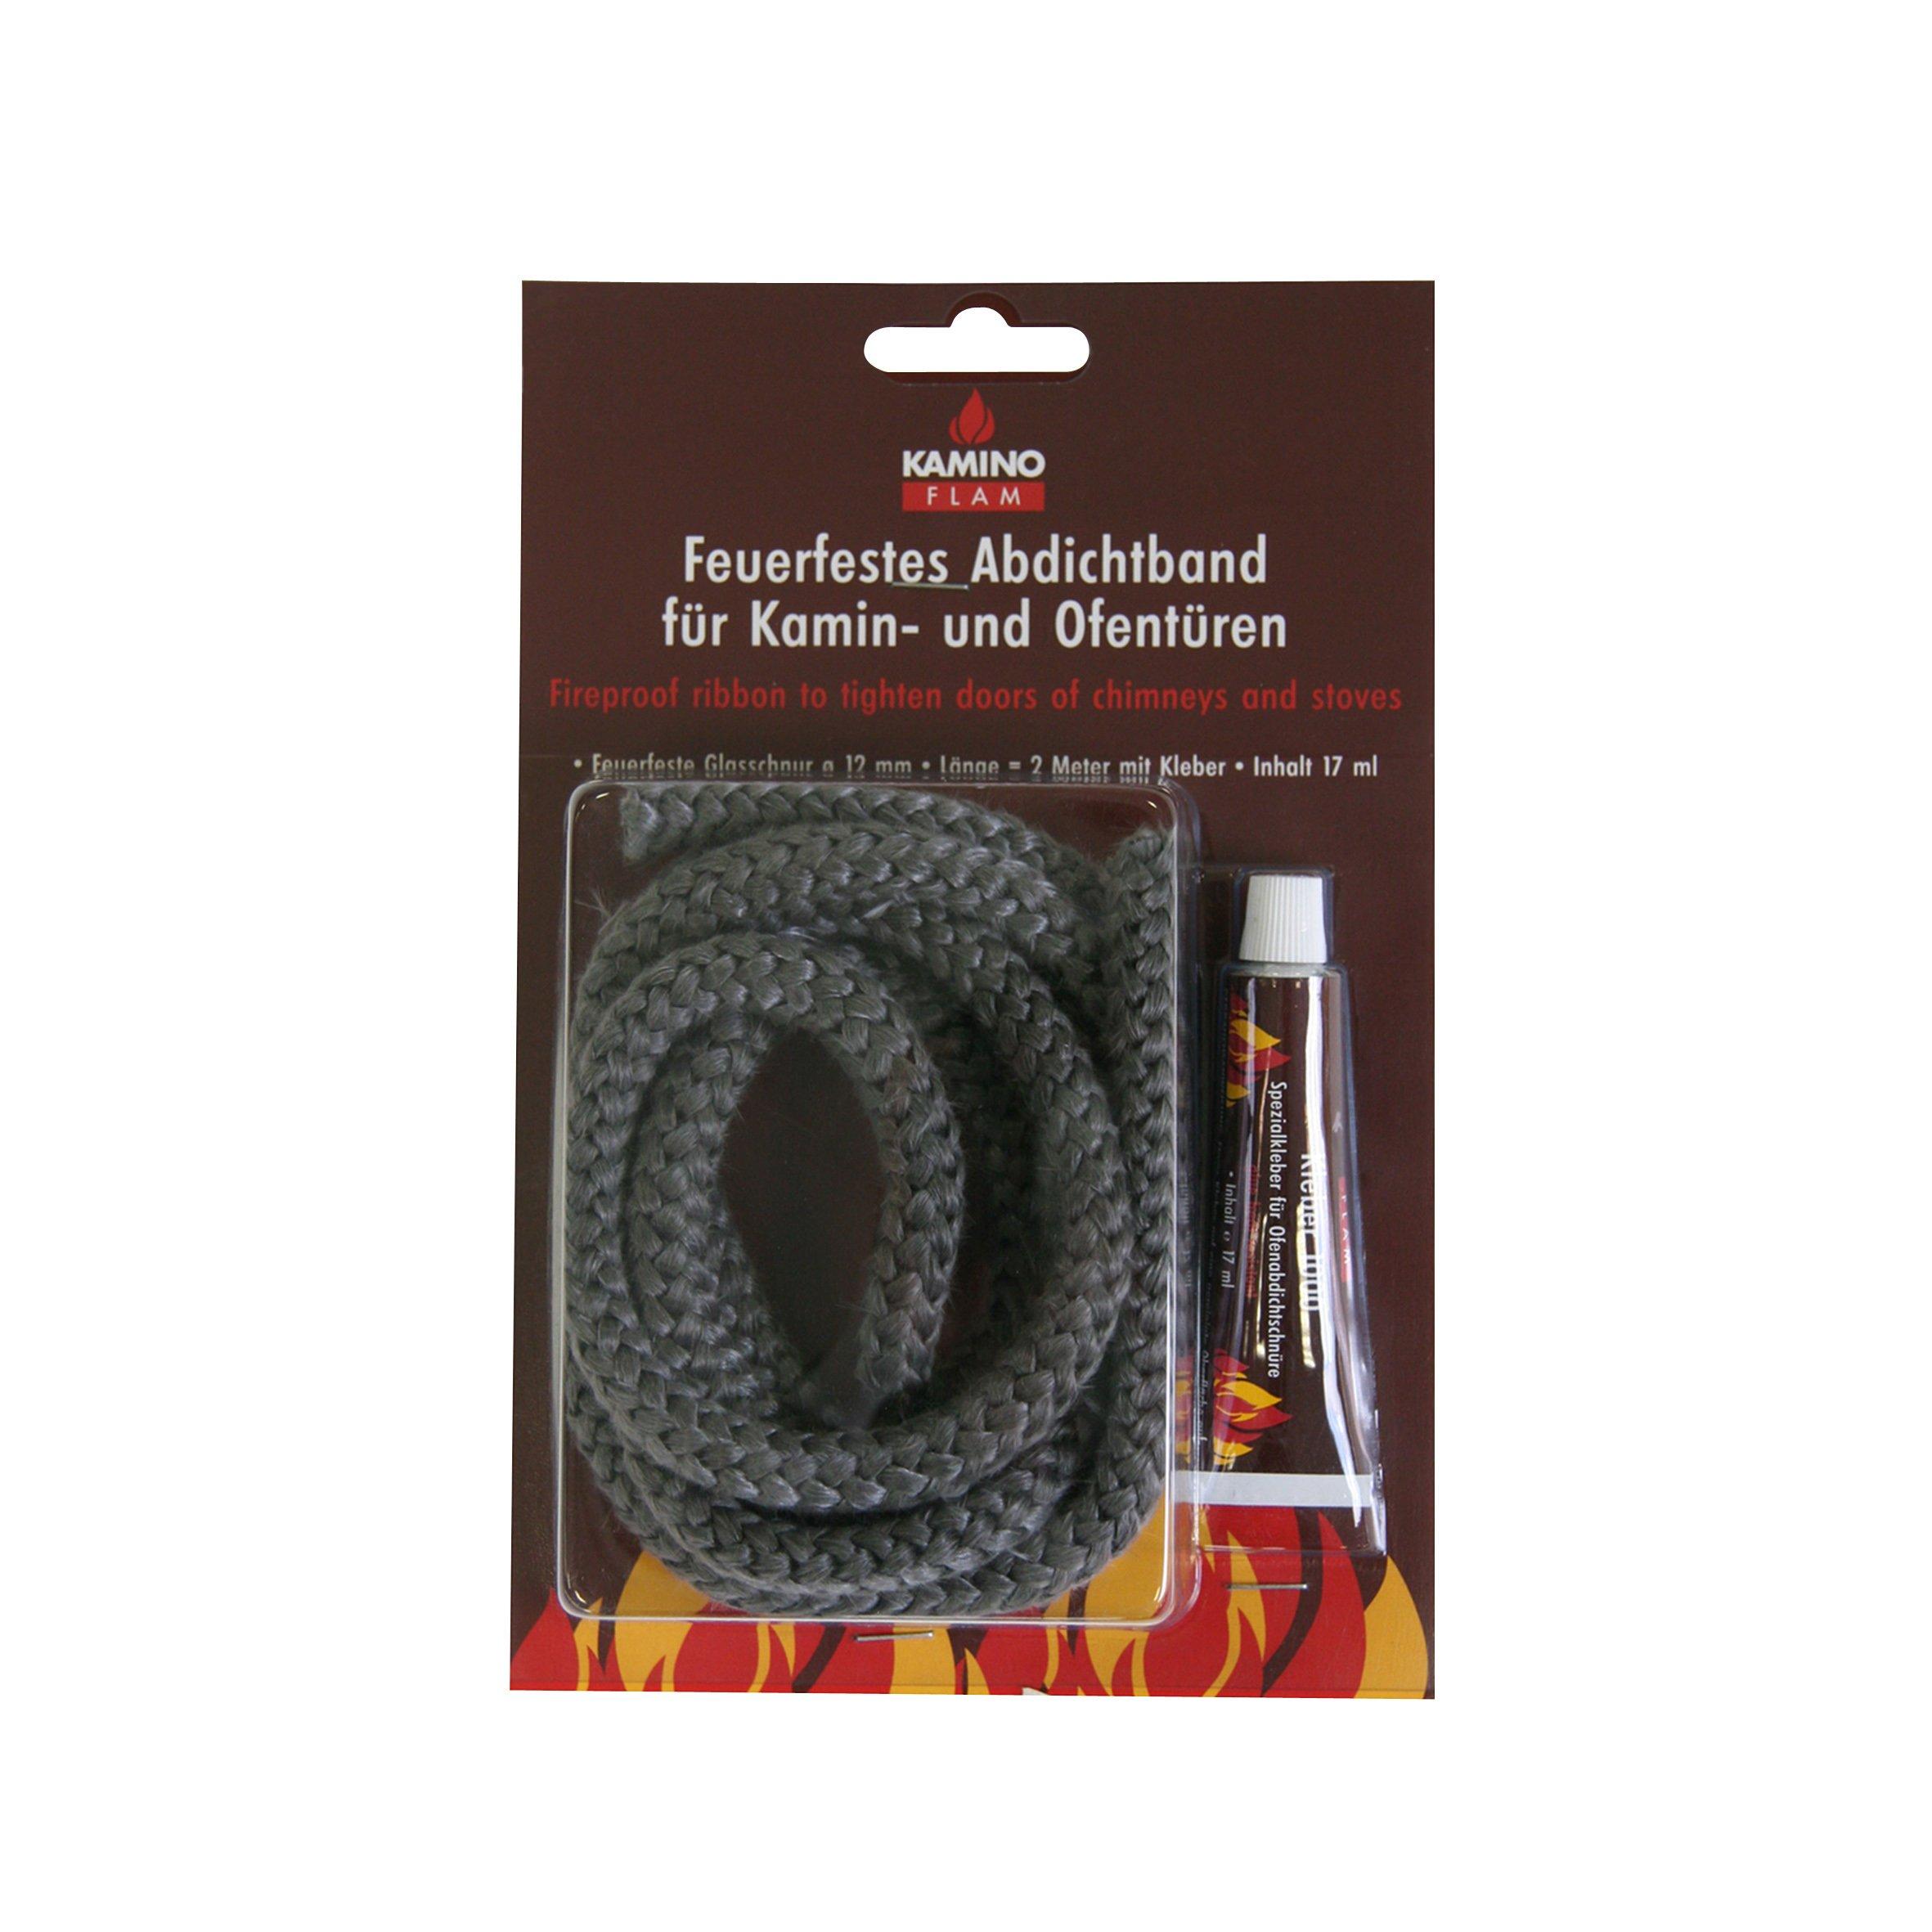 Stove Door Replacement Fibreglass Rope Kit 3mm x 2m Standard Rope